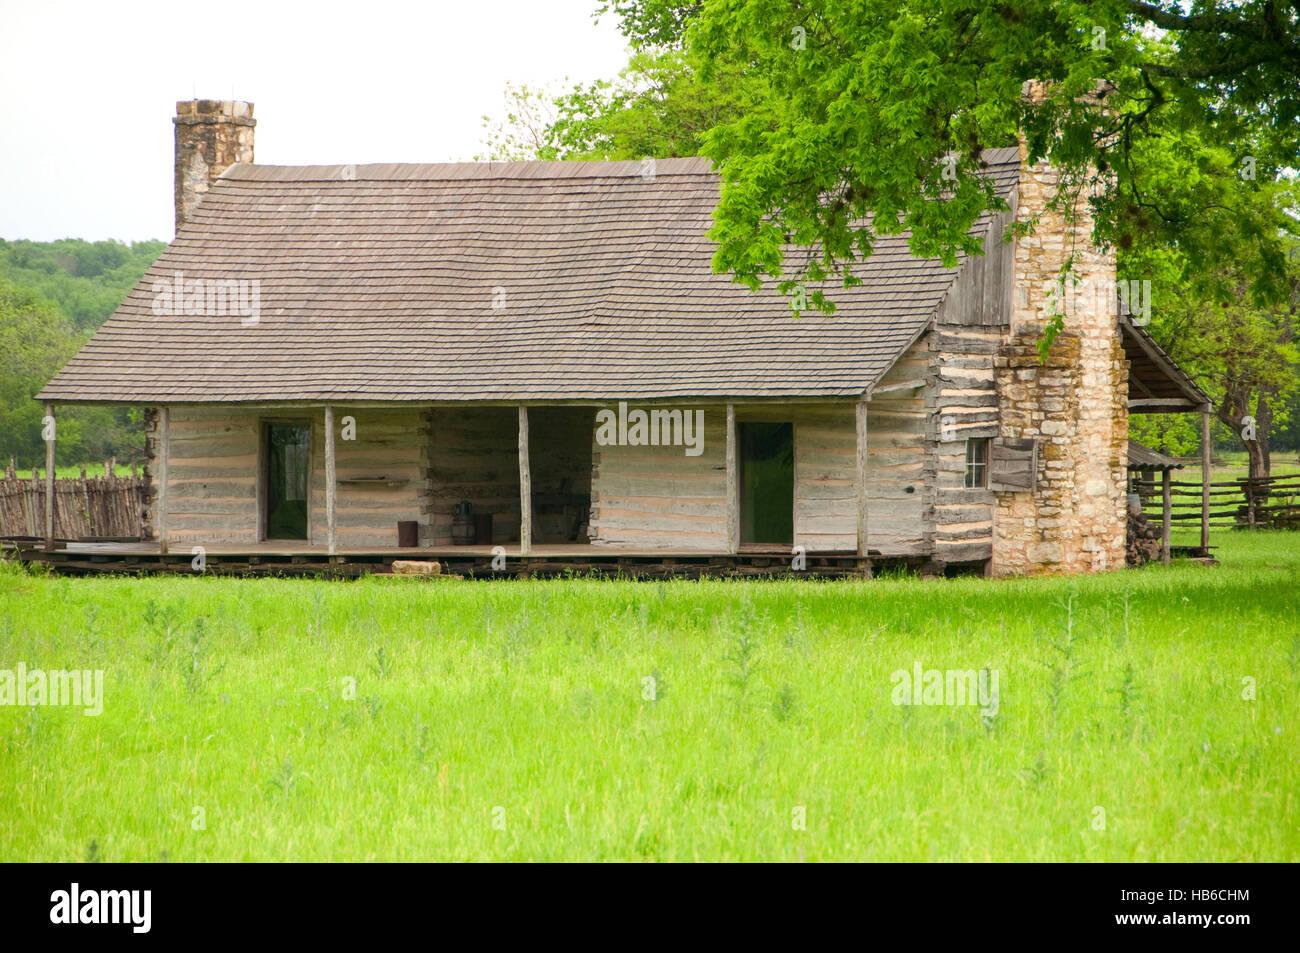 Dog trot cabin lyndon b johnson national historical park texas dog trot cabin lyndon b johnson national historical park texas publicscrutiny Image collections